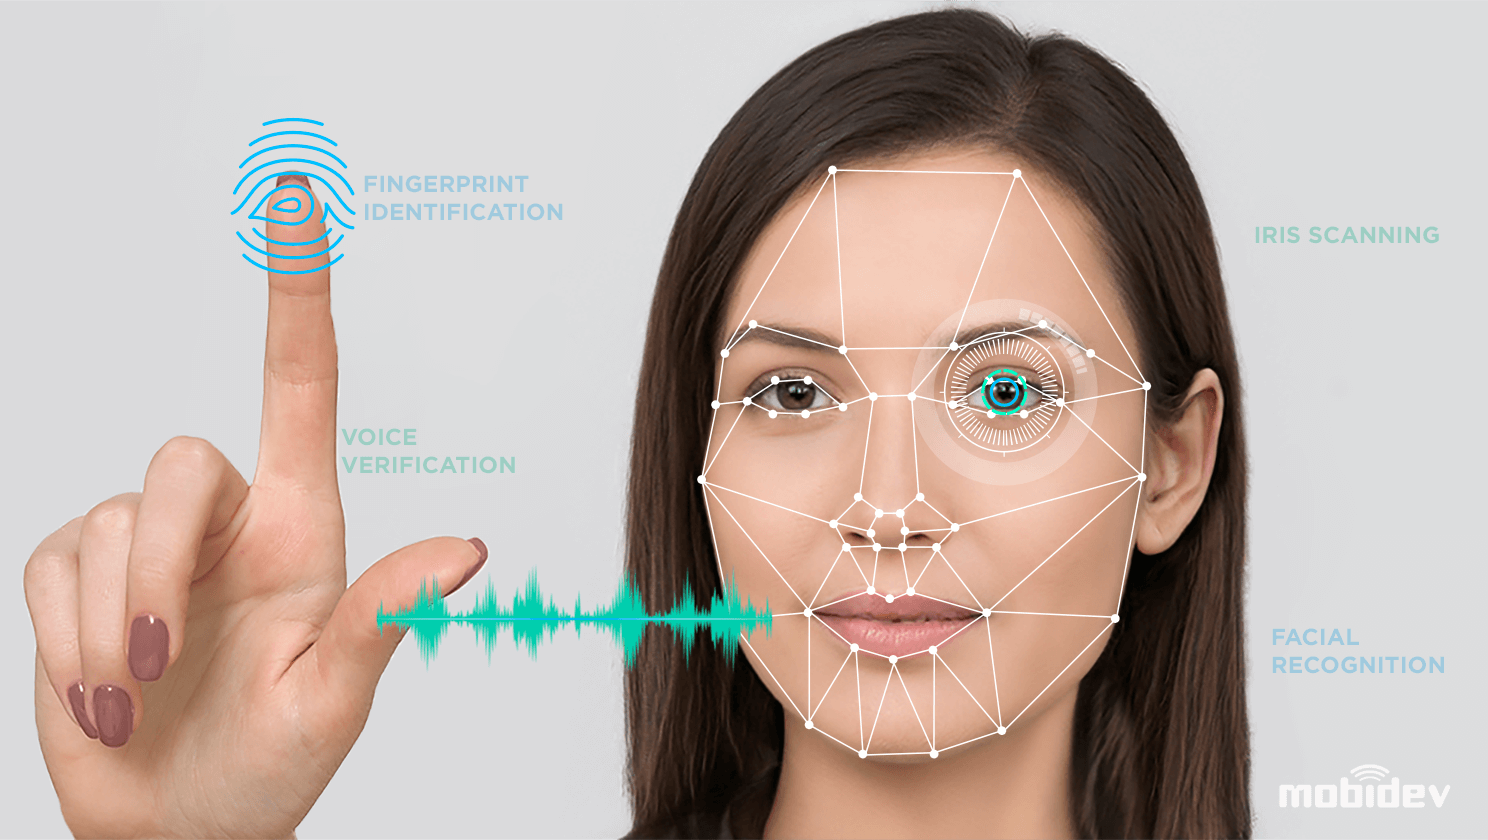 Multimodal Biometric Verification for Business Security System Development